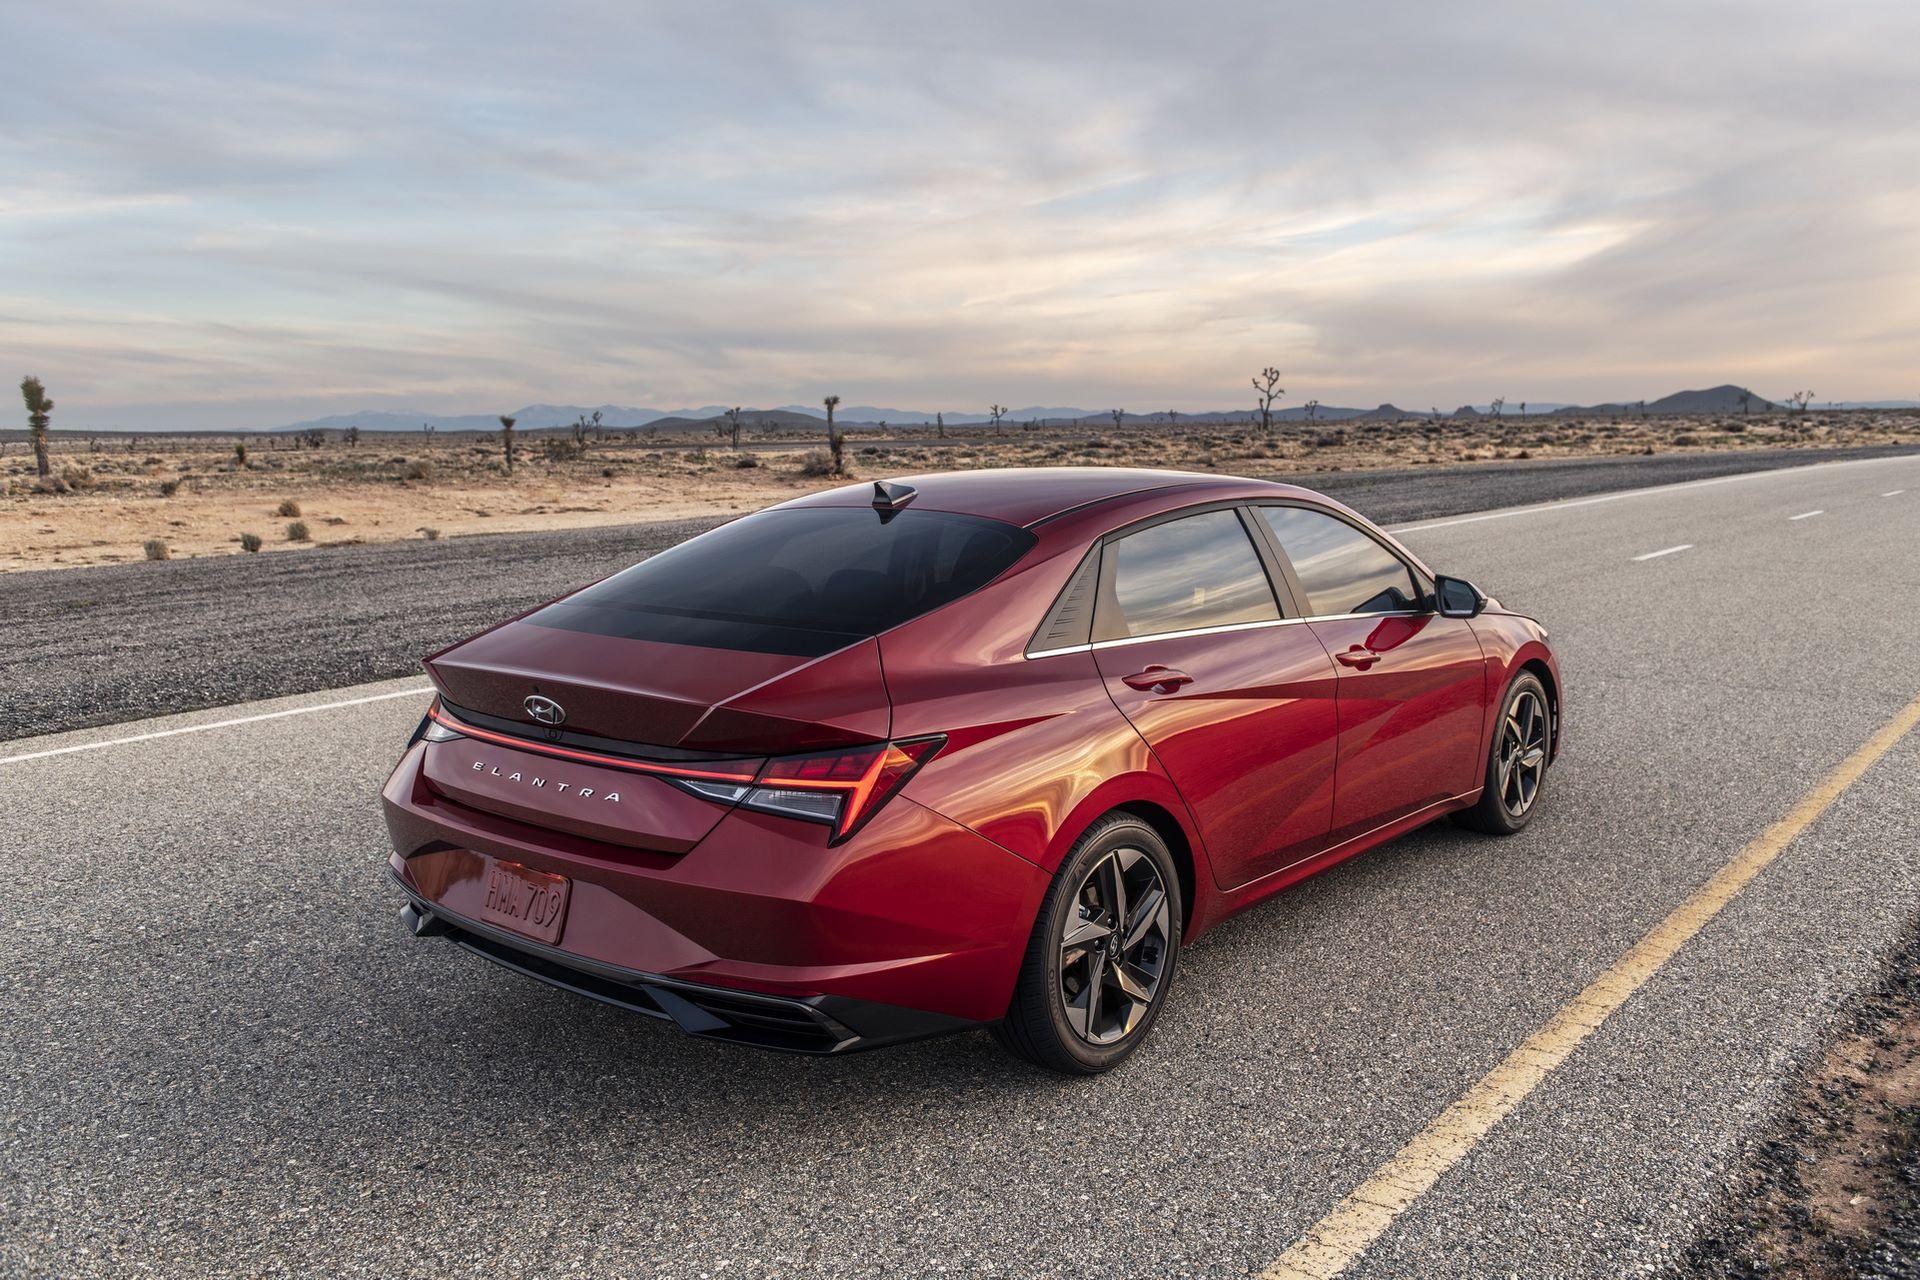 Hyundai-Elantra-2021-8